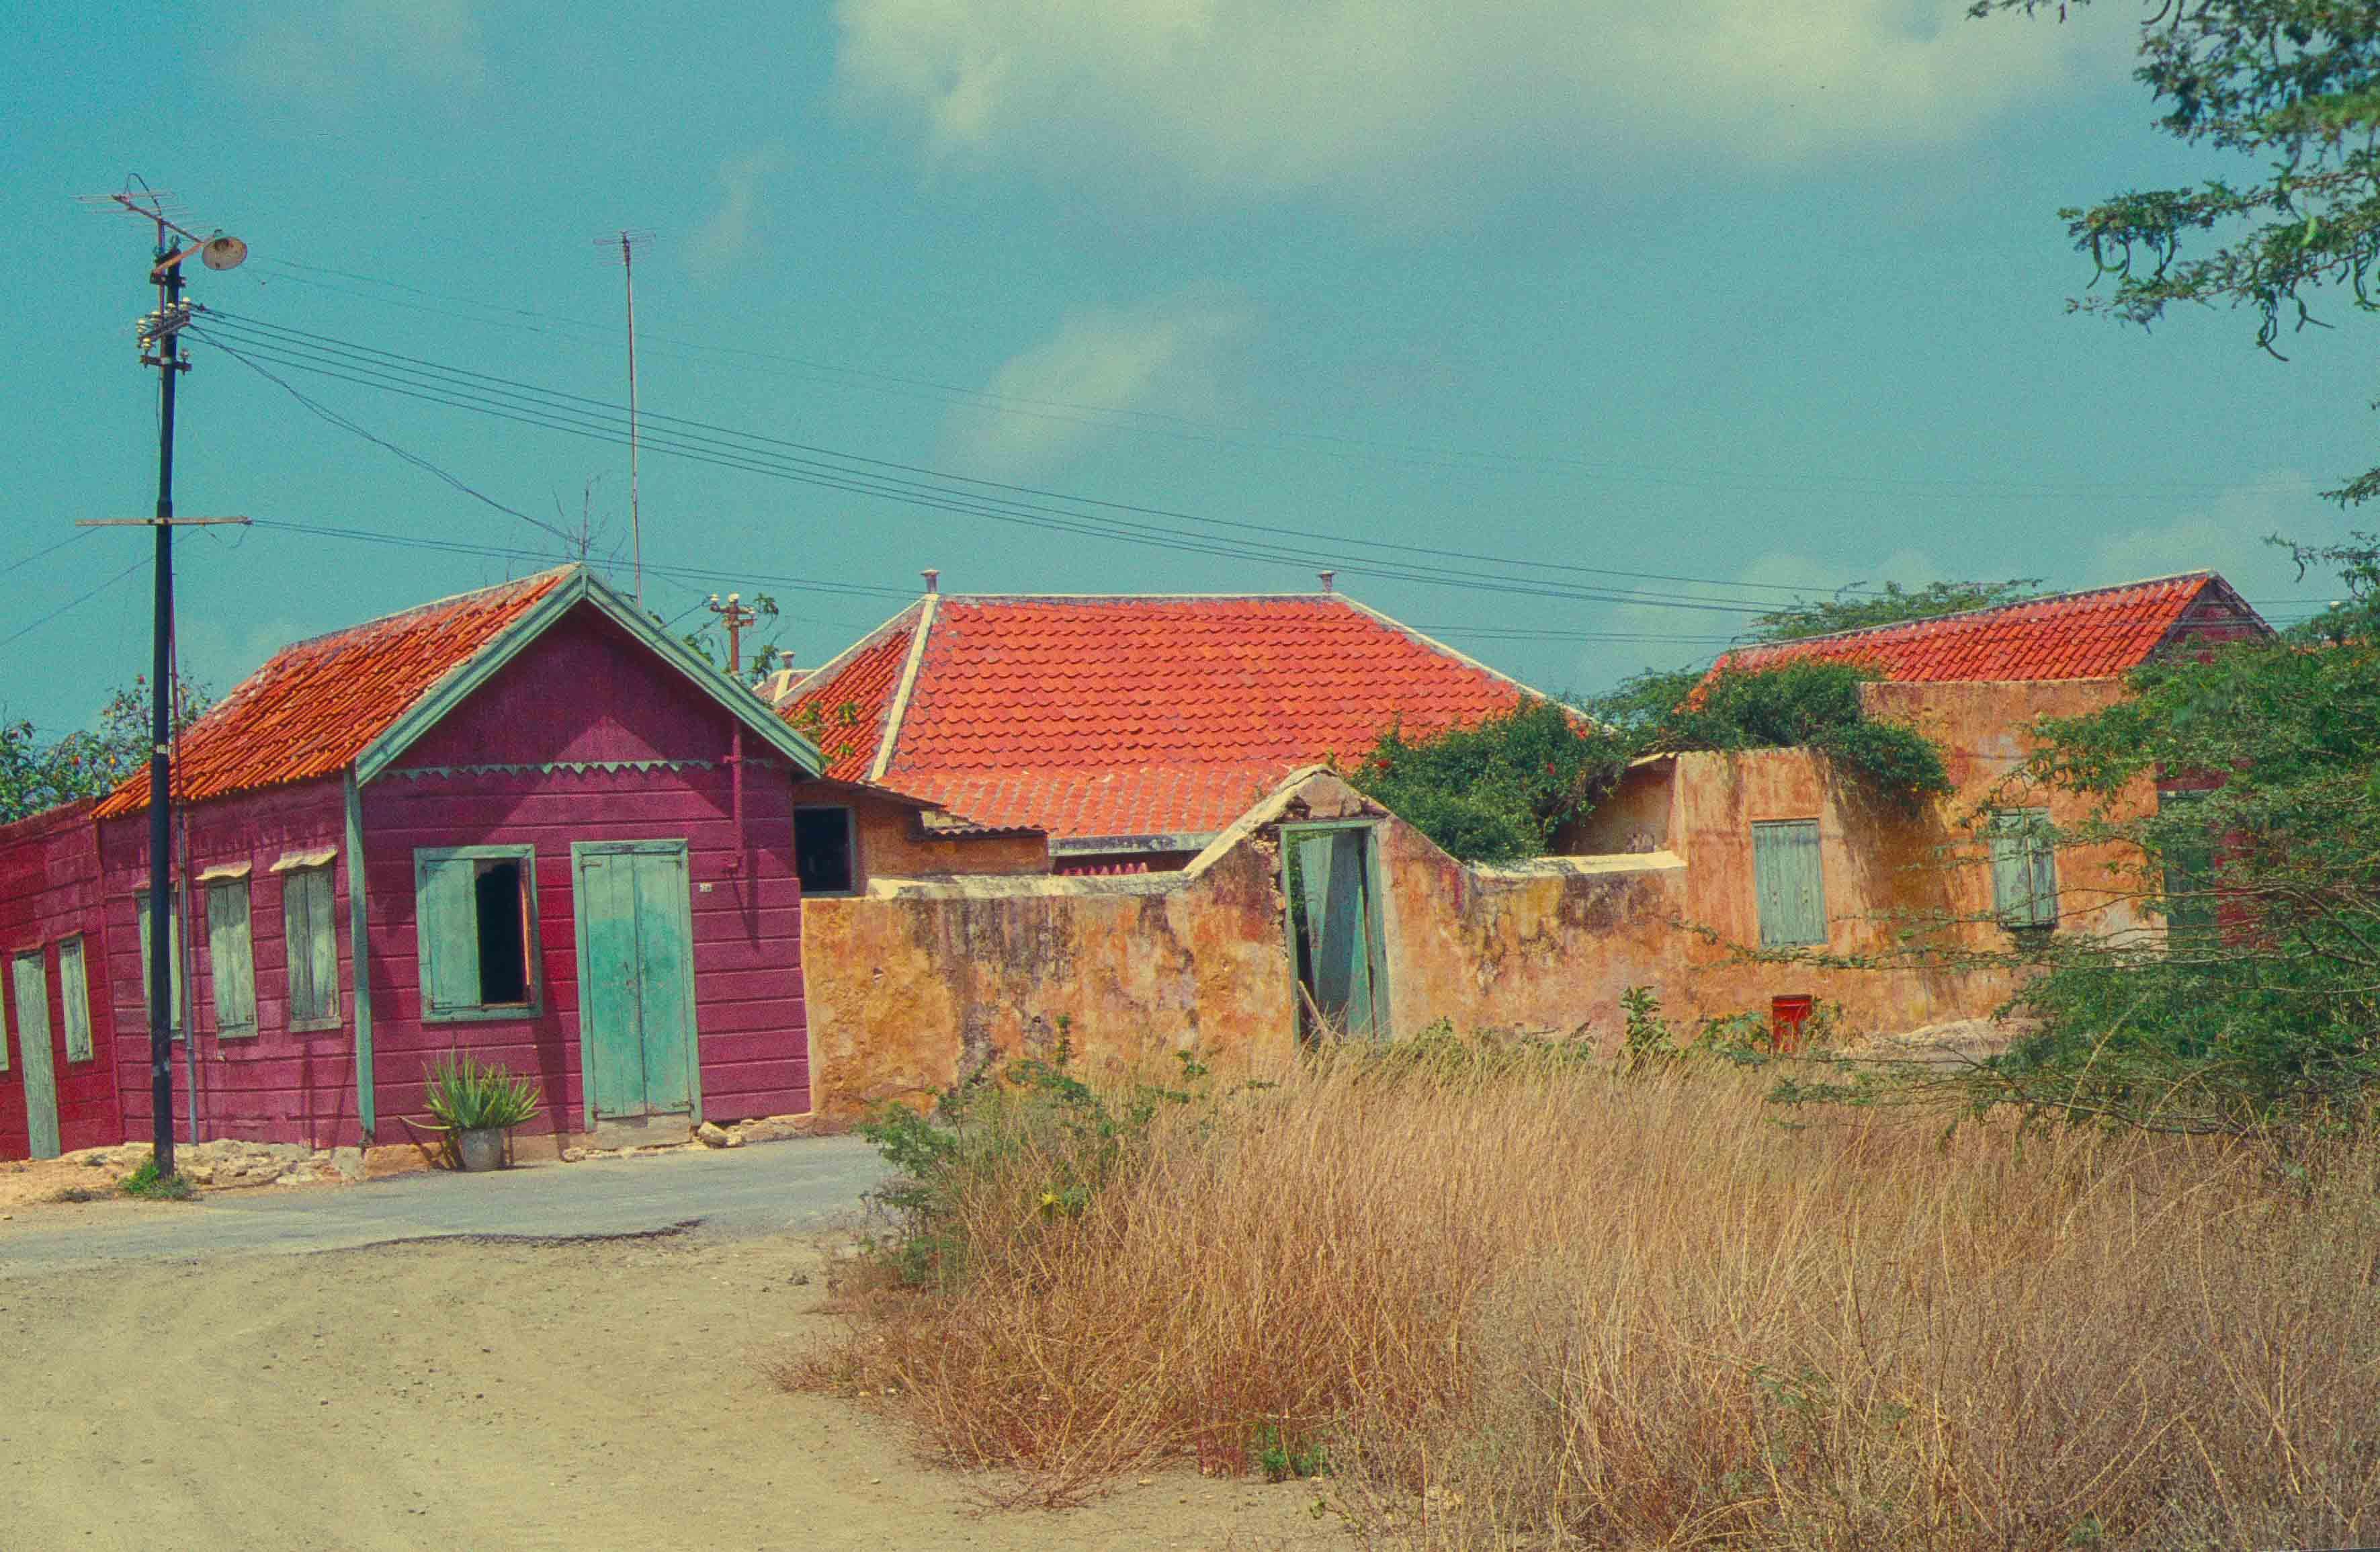 646. Suriname